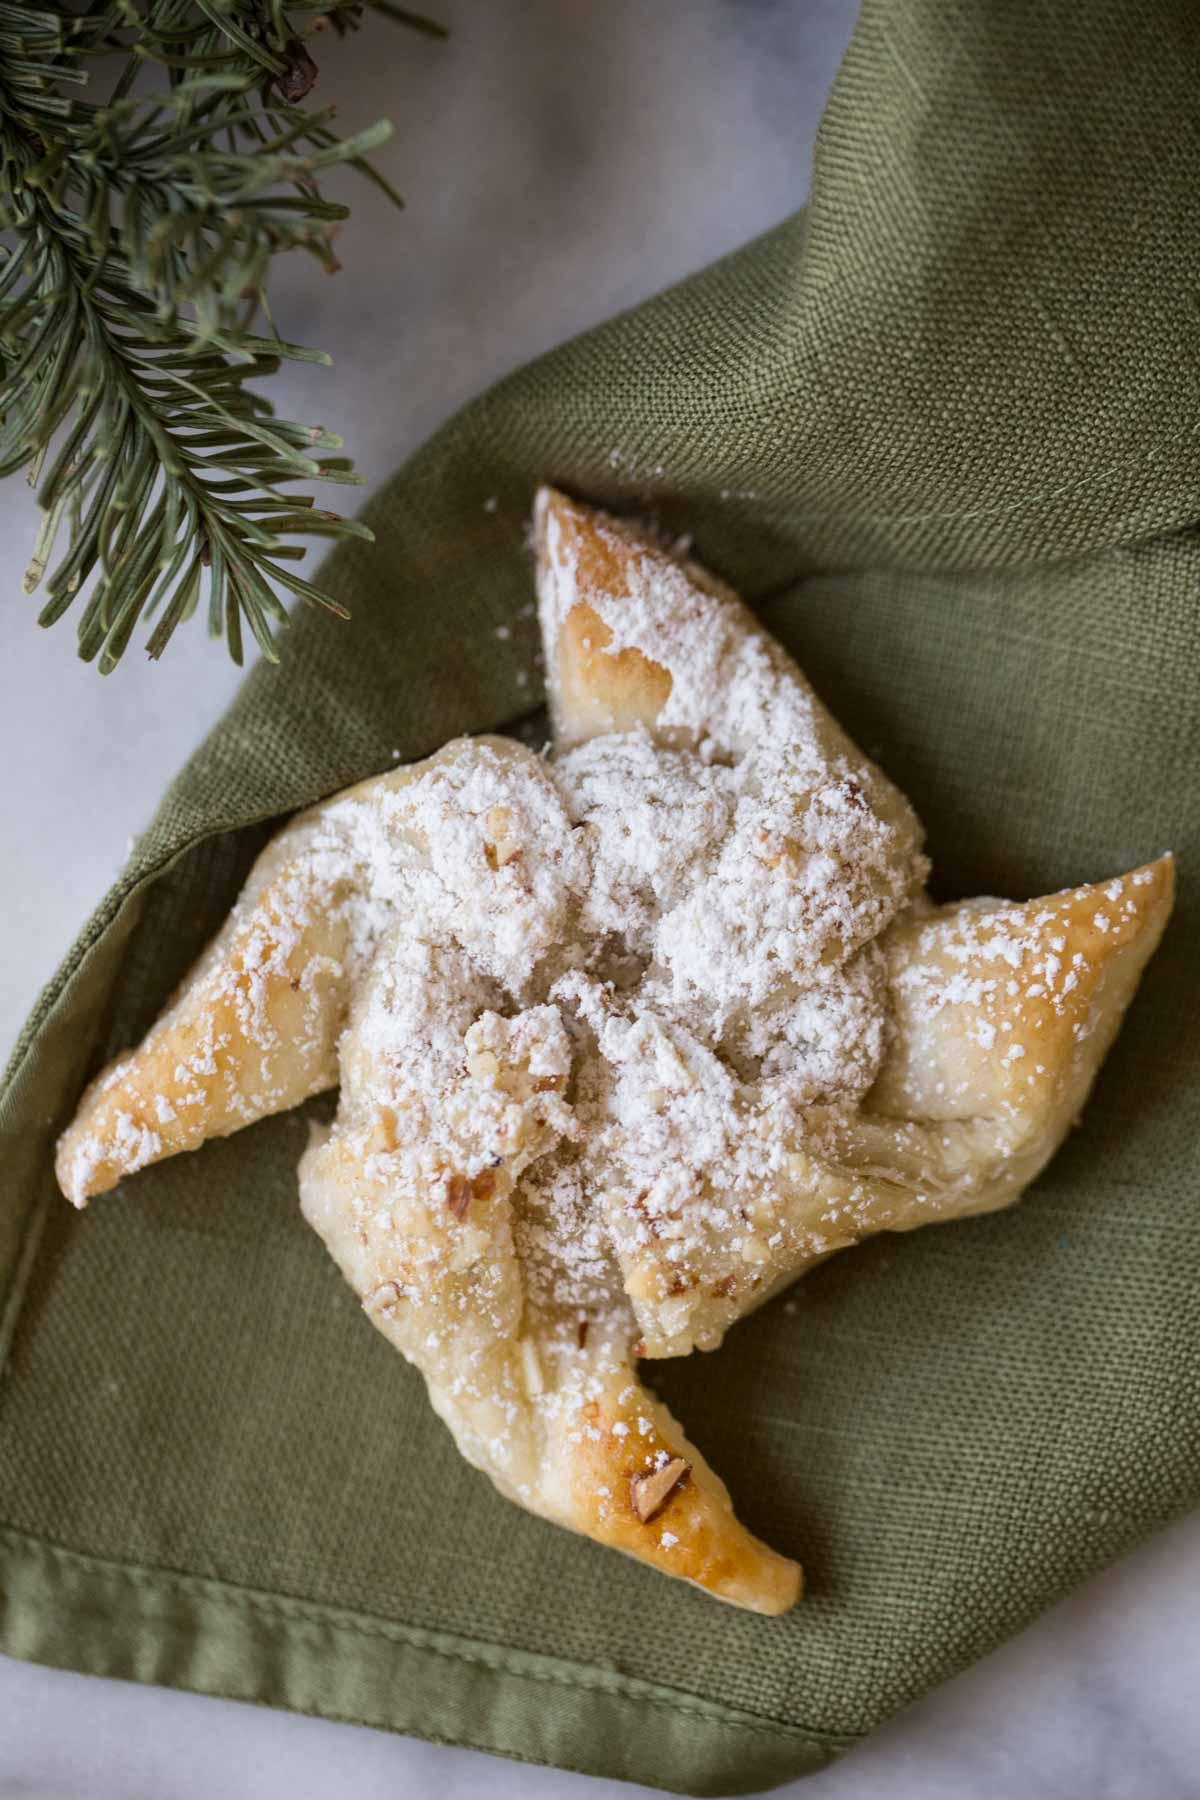 A Make Ahead Almond Pinwheel sitting on a green cloth napkin.